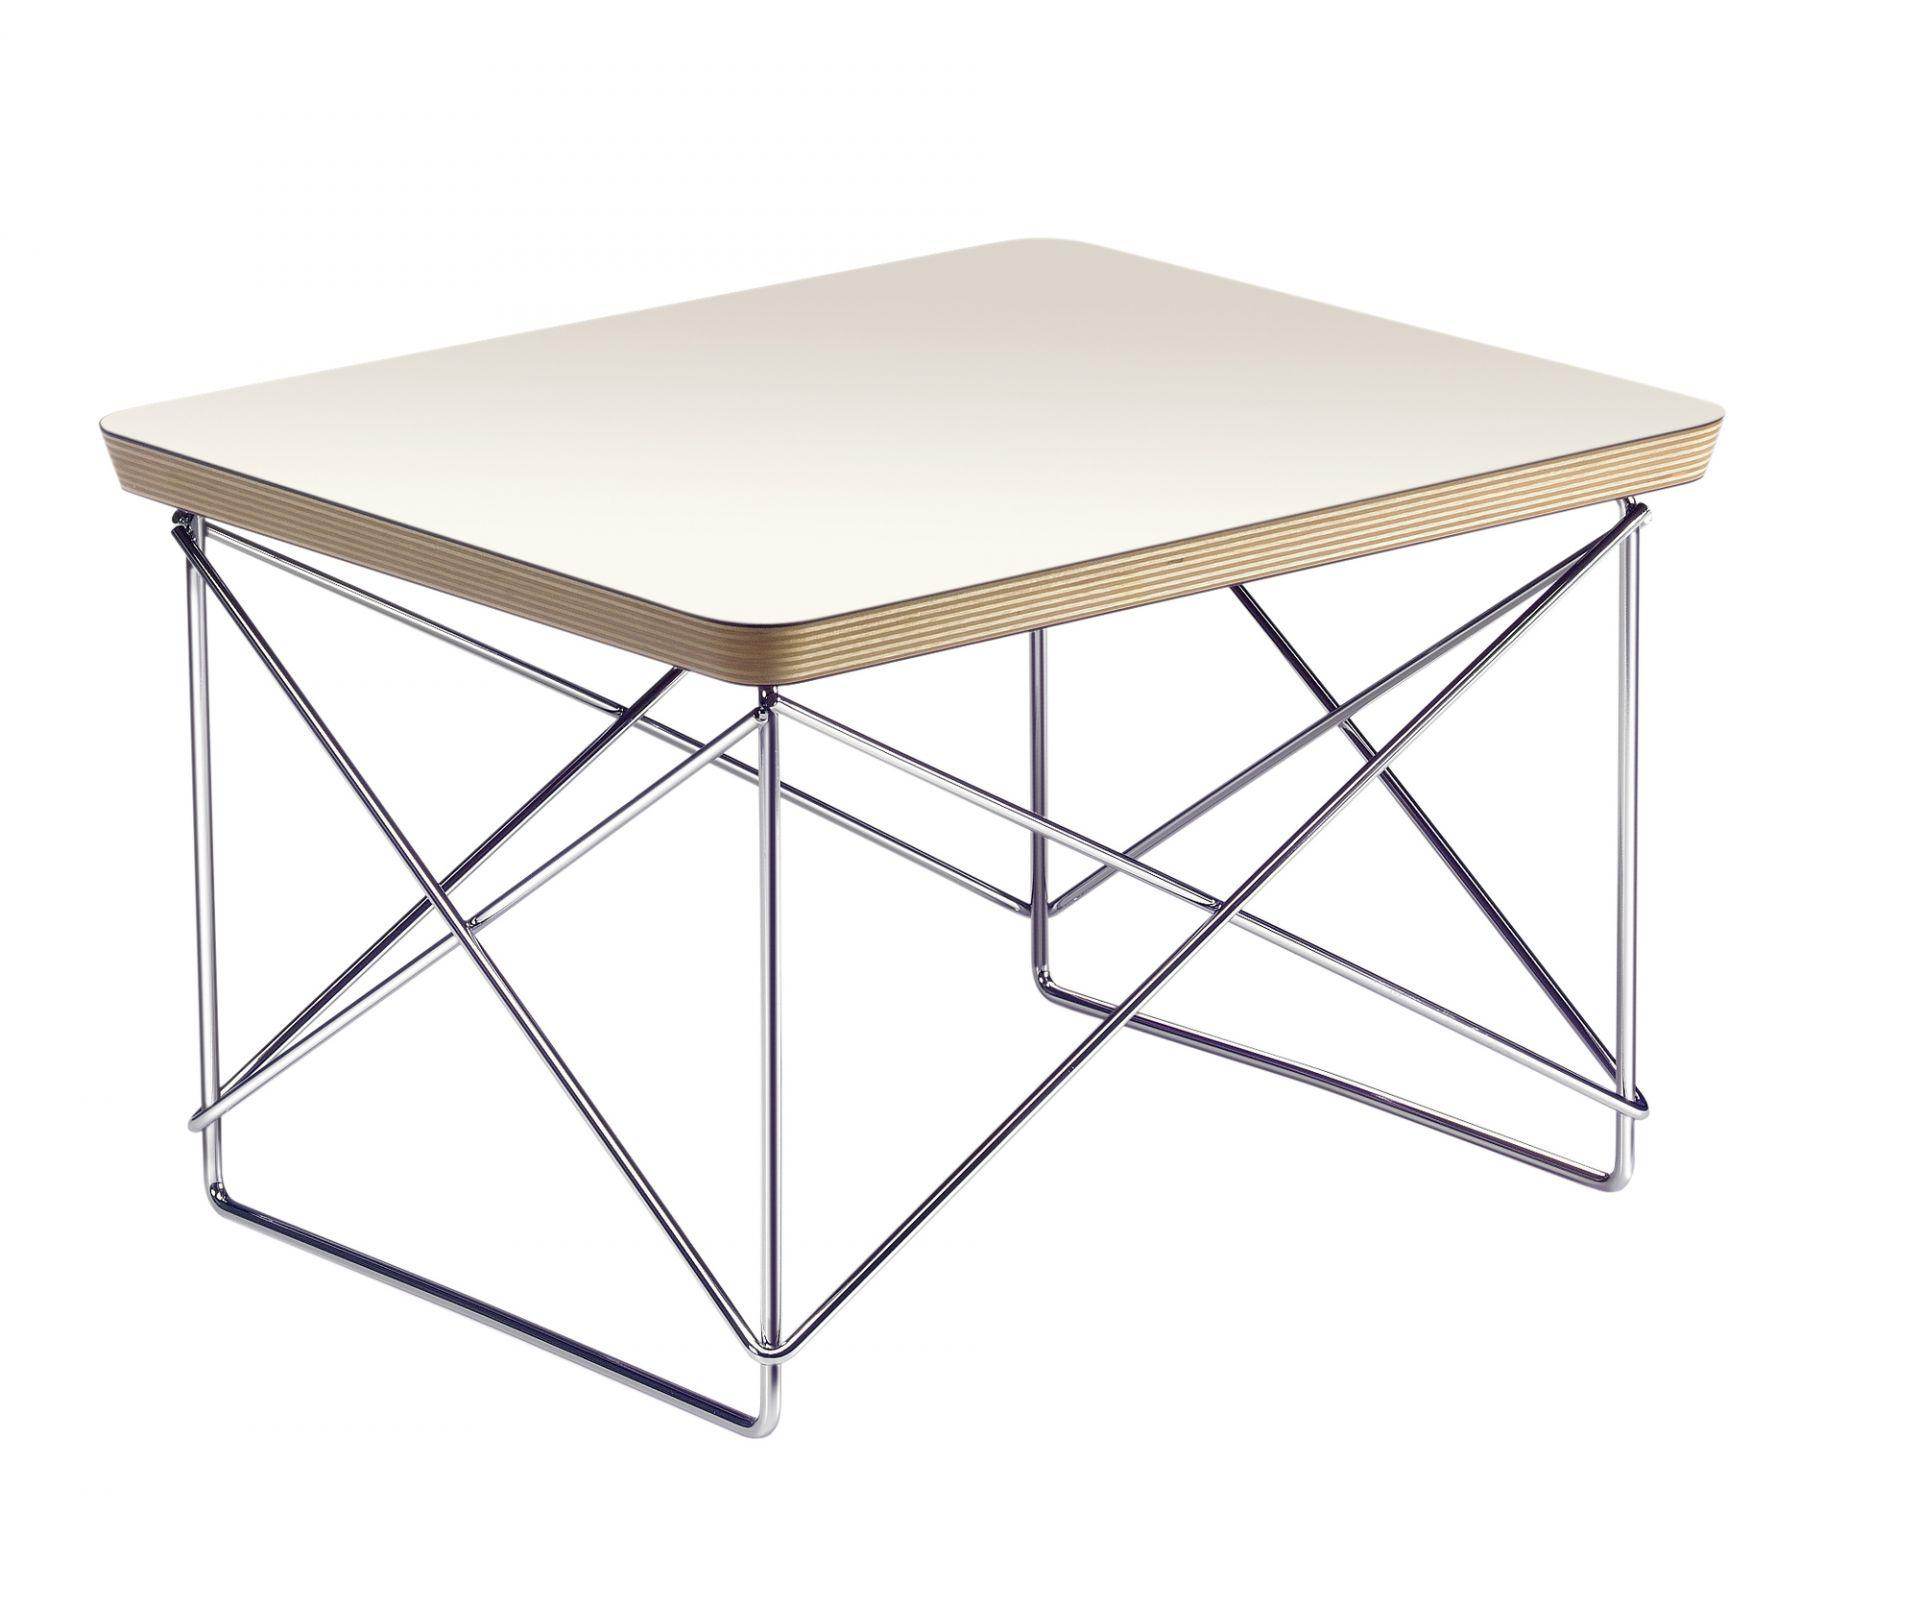 Occasional Table LTR Beistelltisch HPL Schwarz - Verchromt Vitra